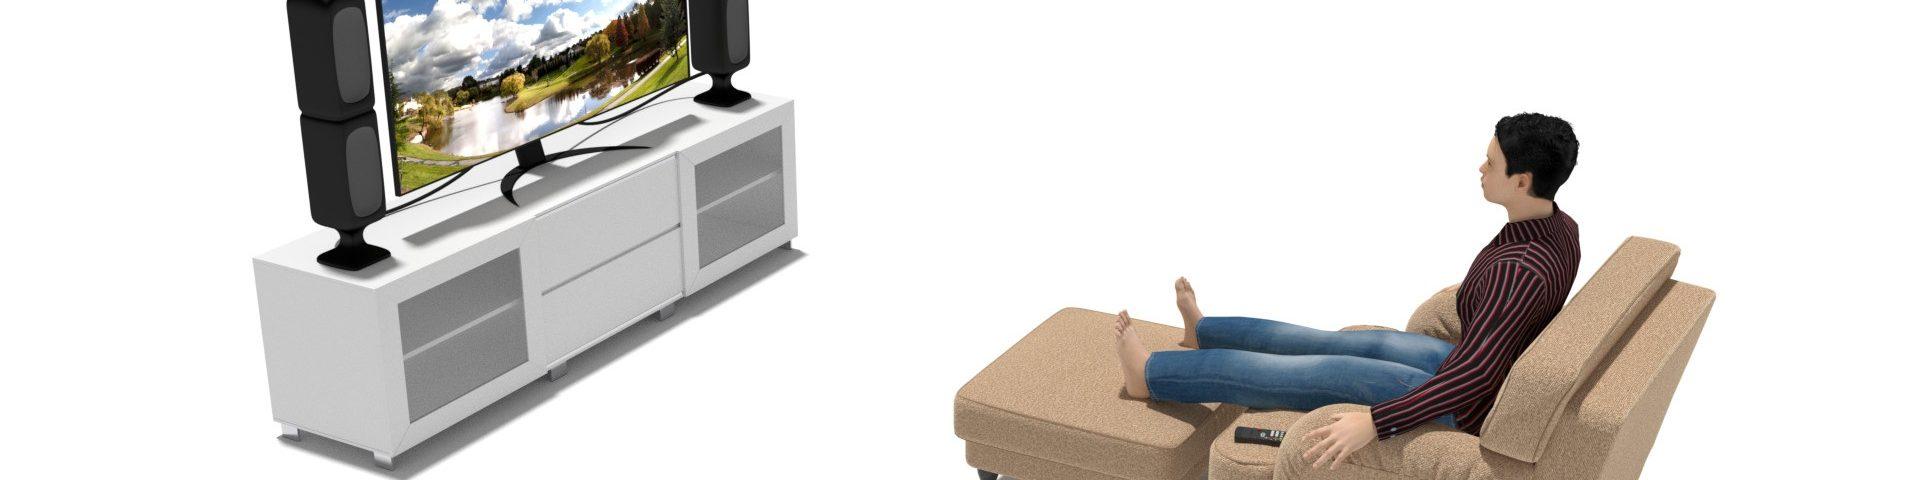 Best Ergonomic Chair For Watching TV - Ibandhu